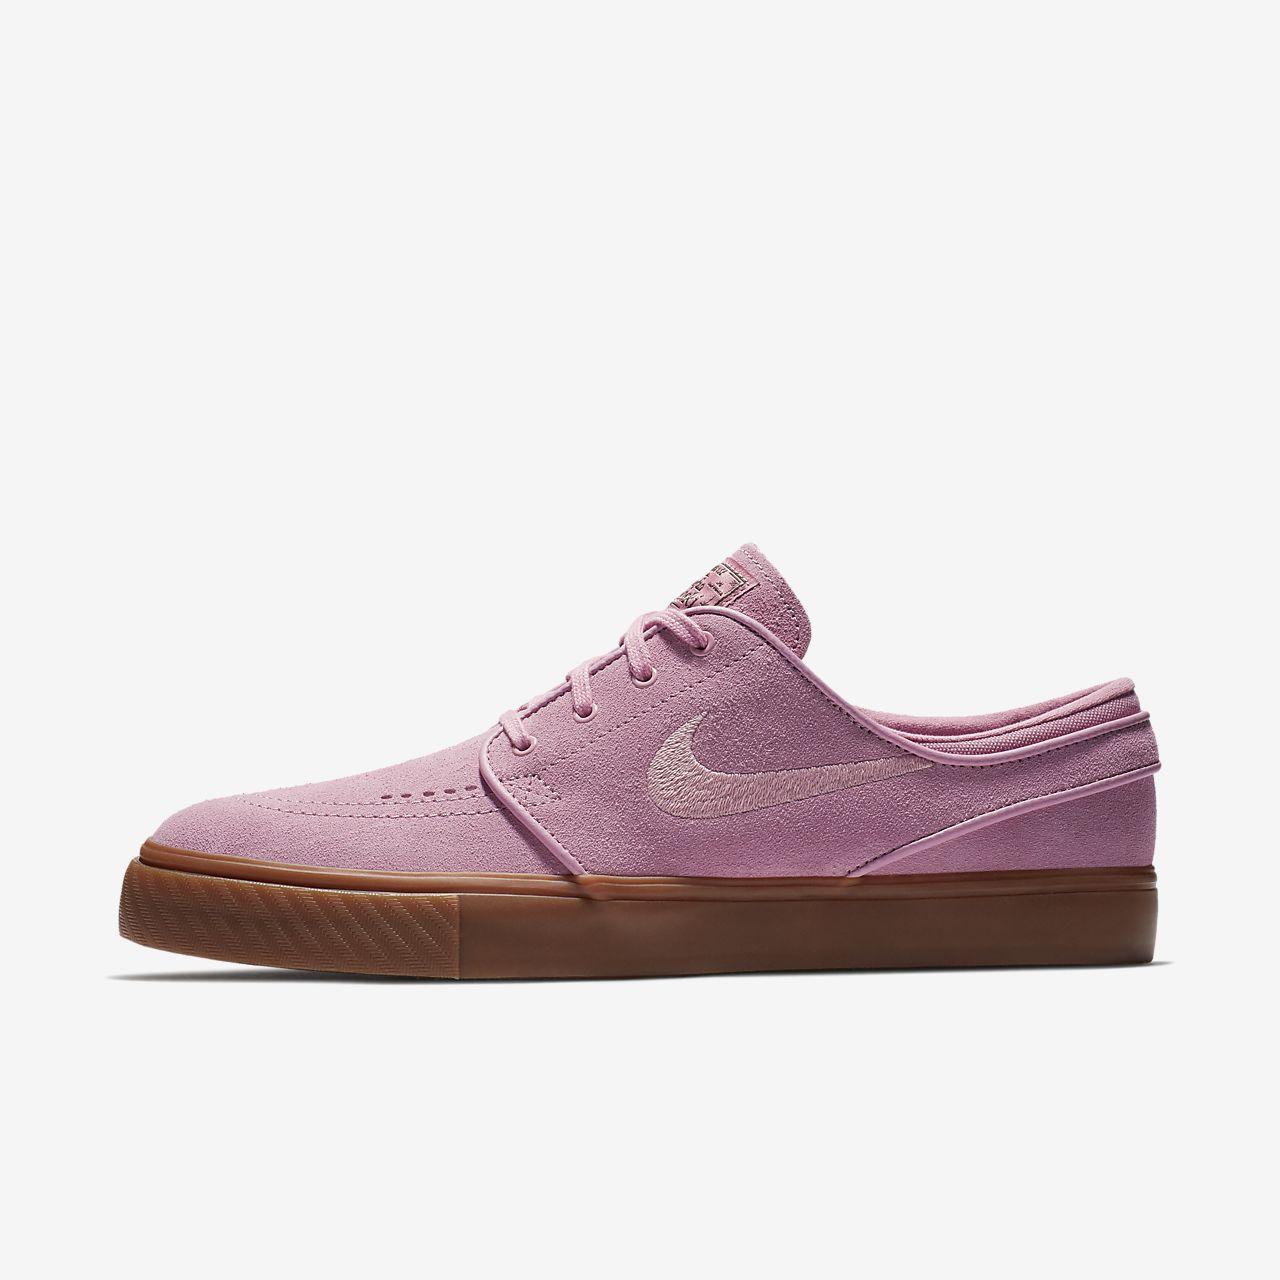 Nike SB Zoom Stefan Janoski Men's Skateboarding Shoes Blue/Brown qP3817C